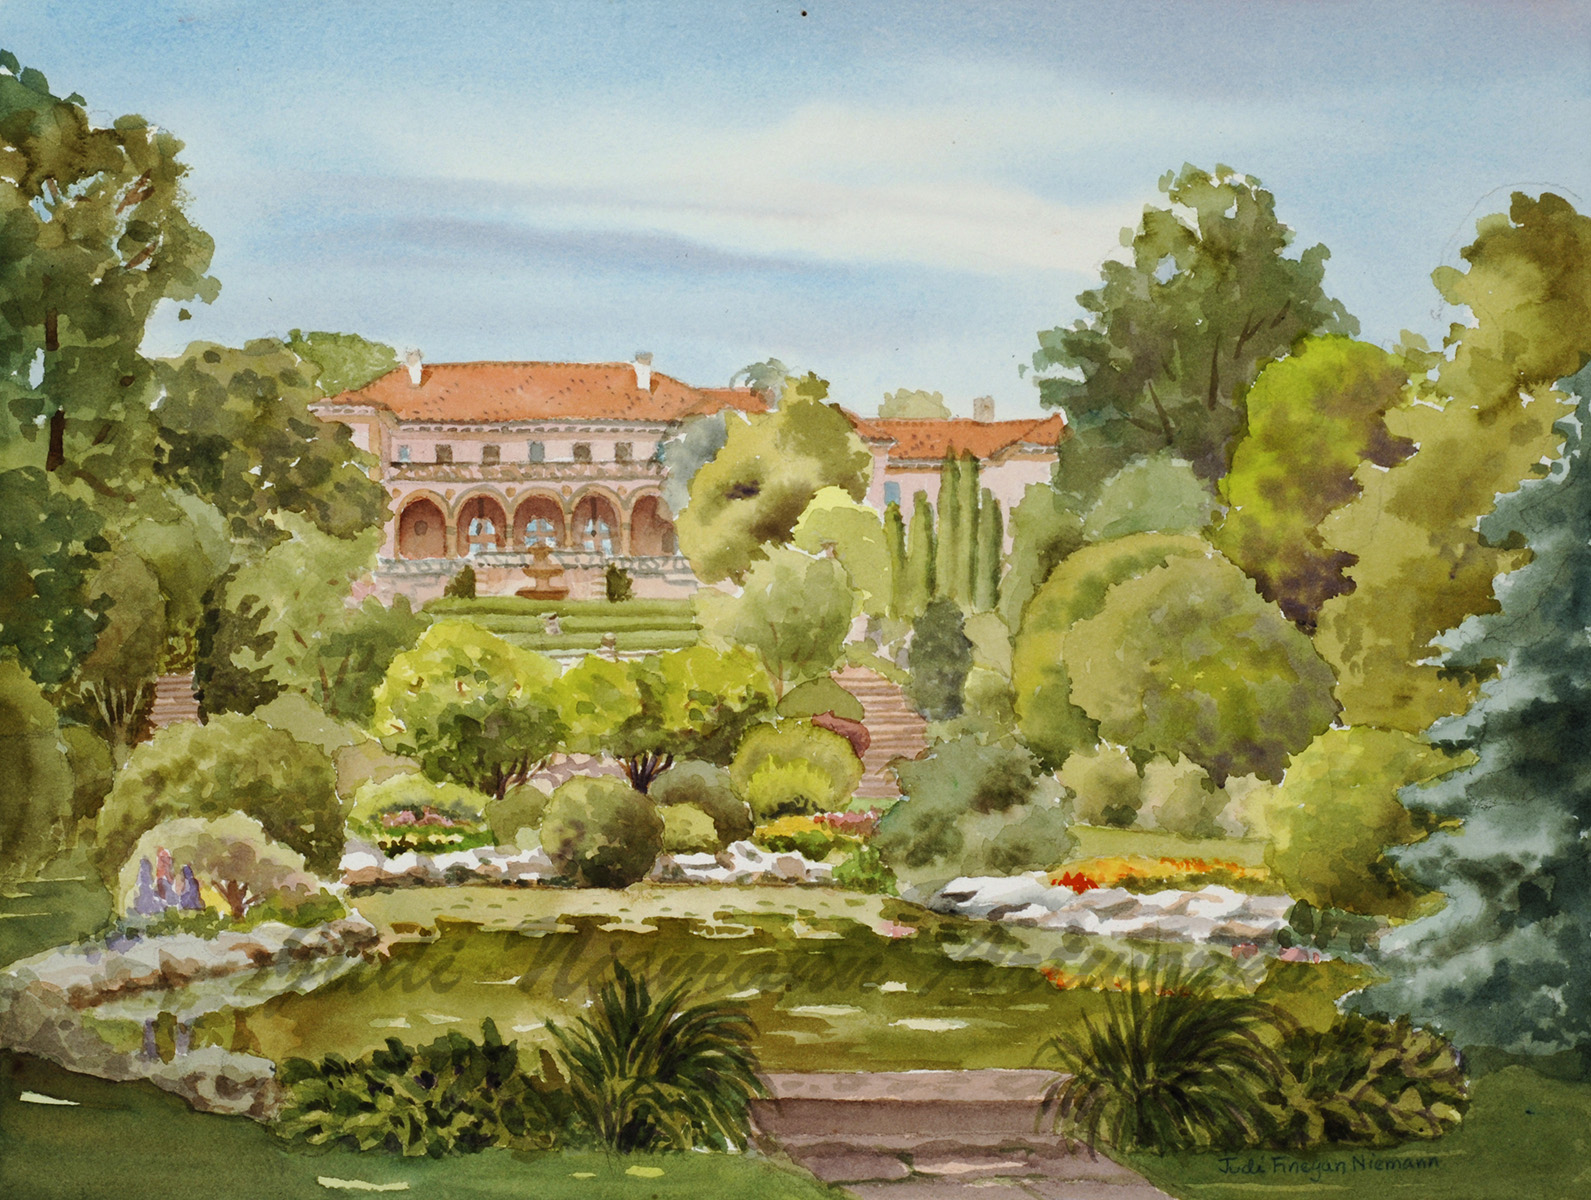 Phillbrook Museum of Art Gardens, Tulsa, OK